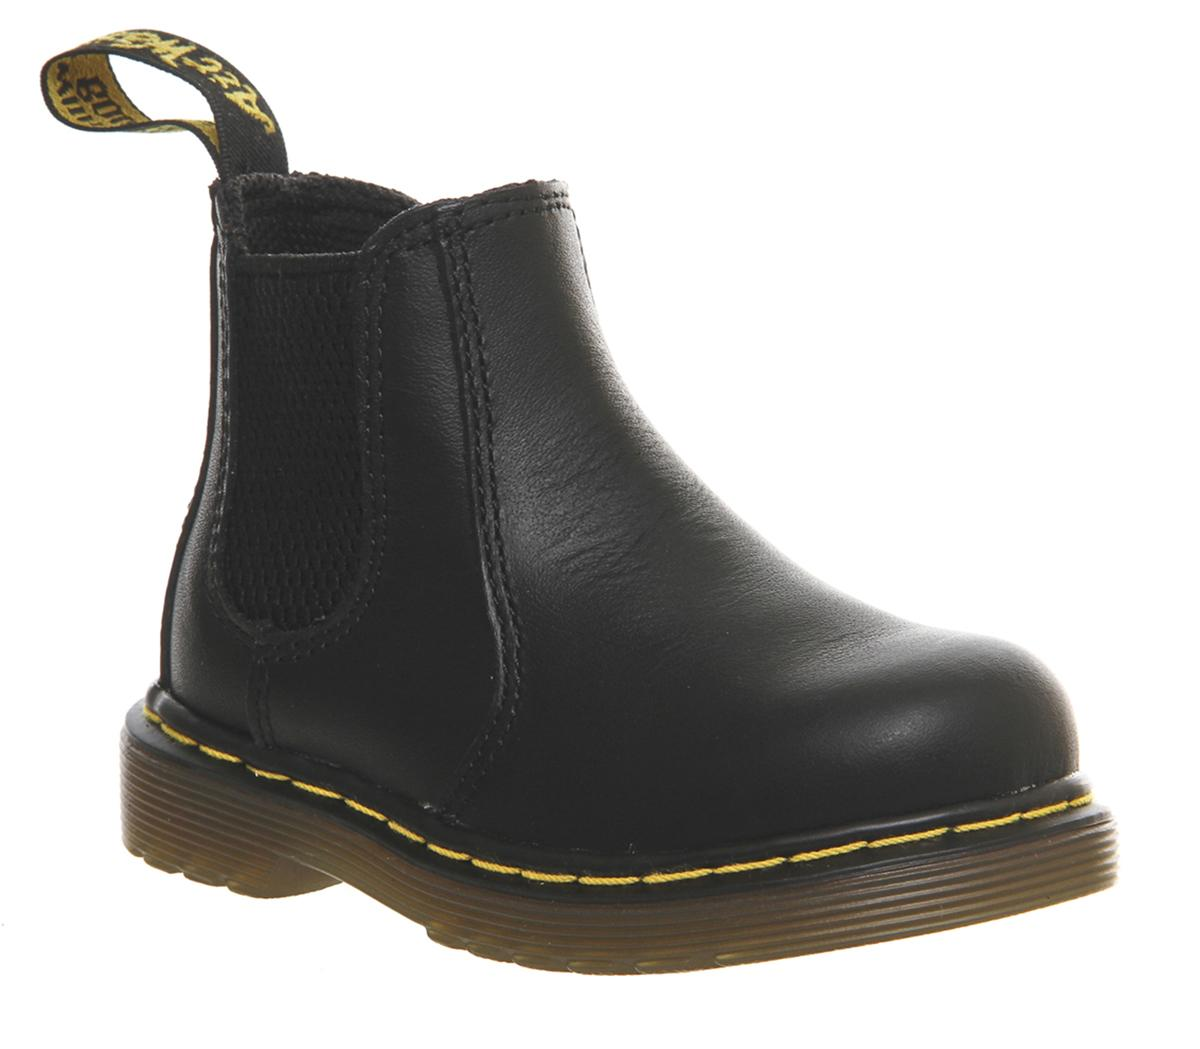 Dr. Martens Banzai Chelsea Boots